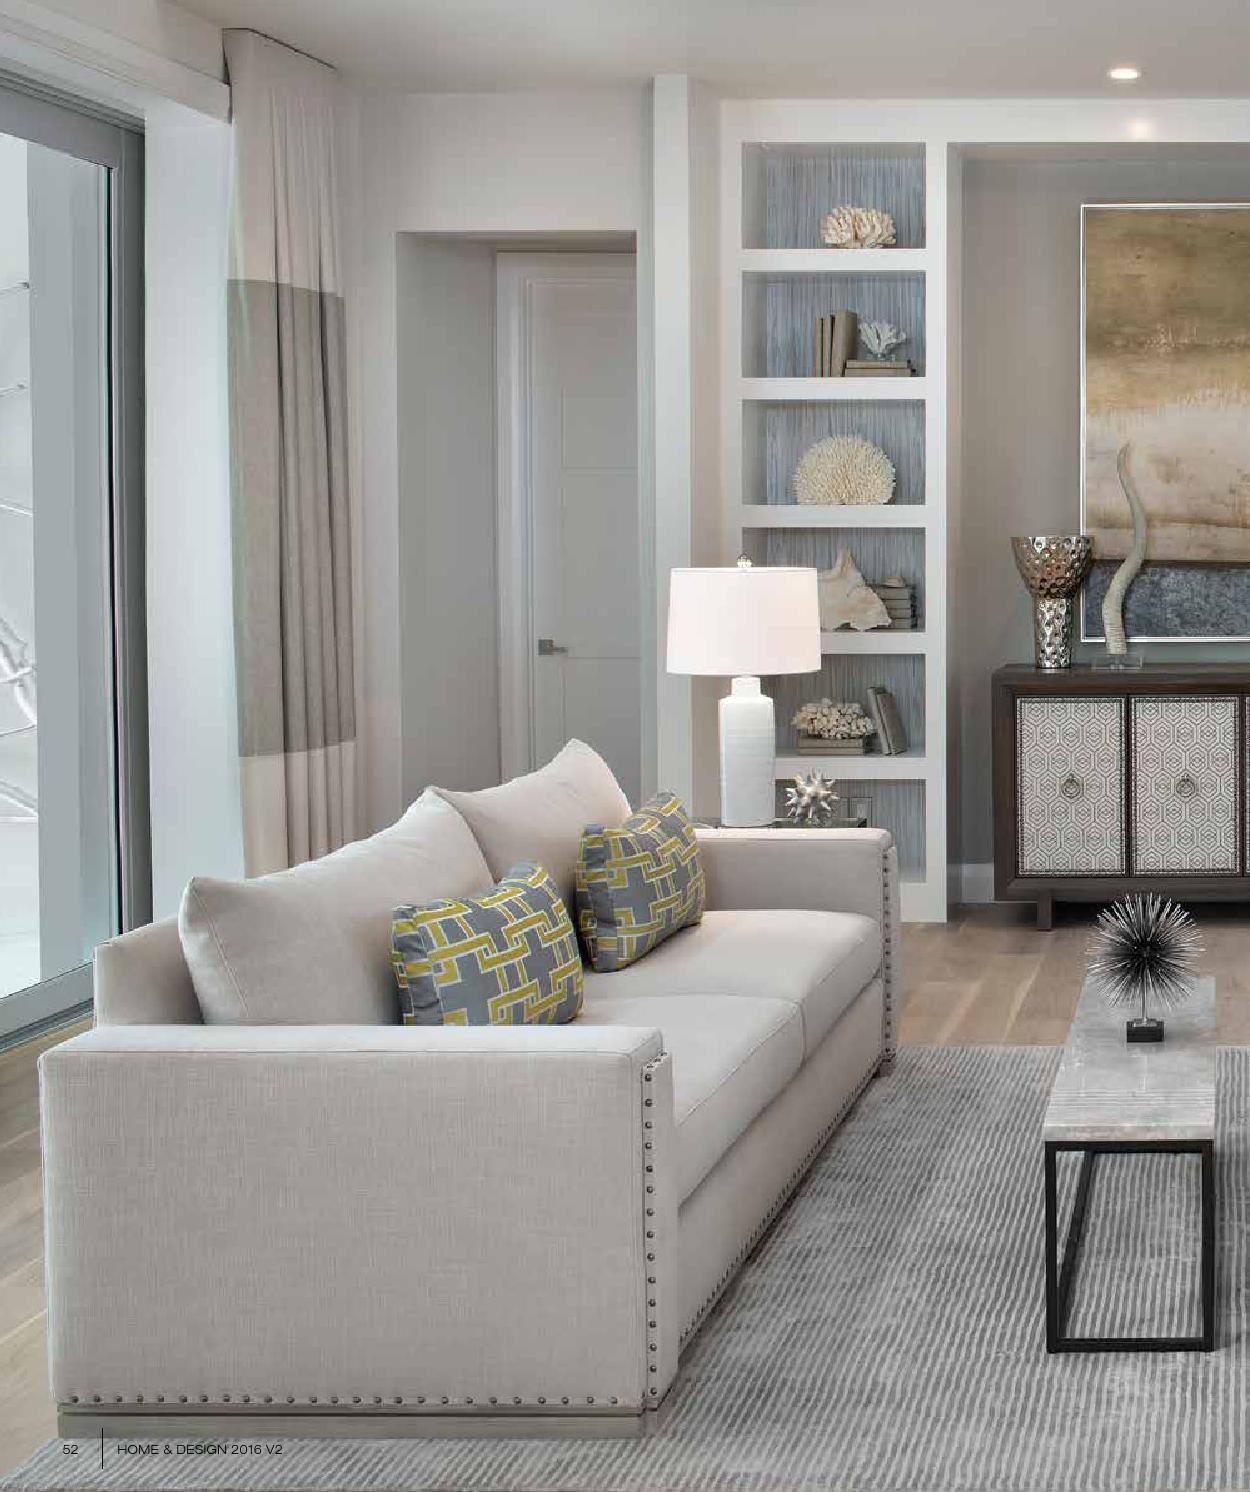 Home Design Magazine 2016 Southwest Florida